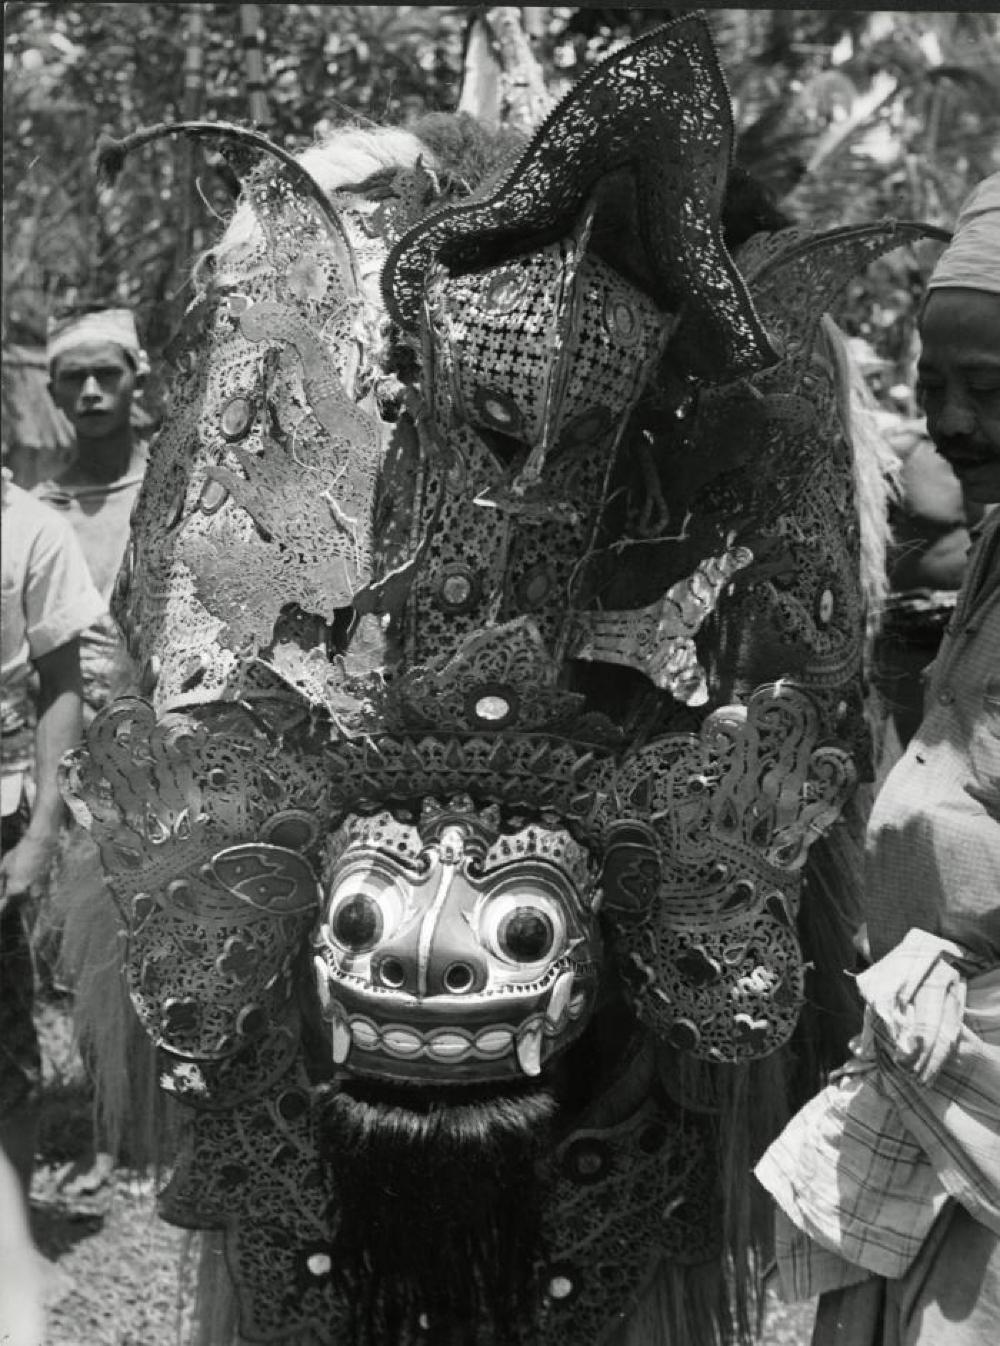 Bollingen travels: Barong performer with Barong Ket mask in Batubulan, Bali, Indonesia, 1950–53